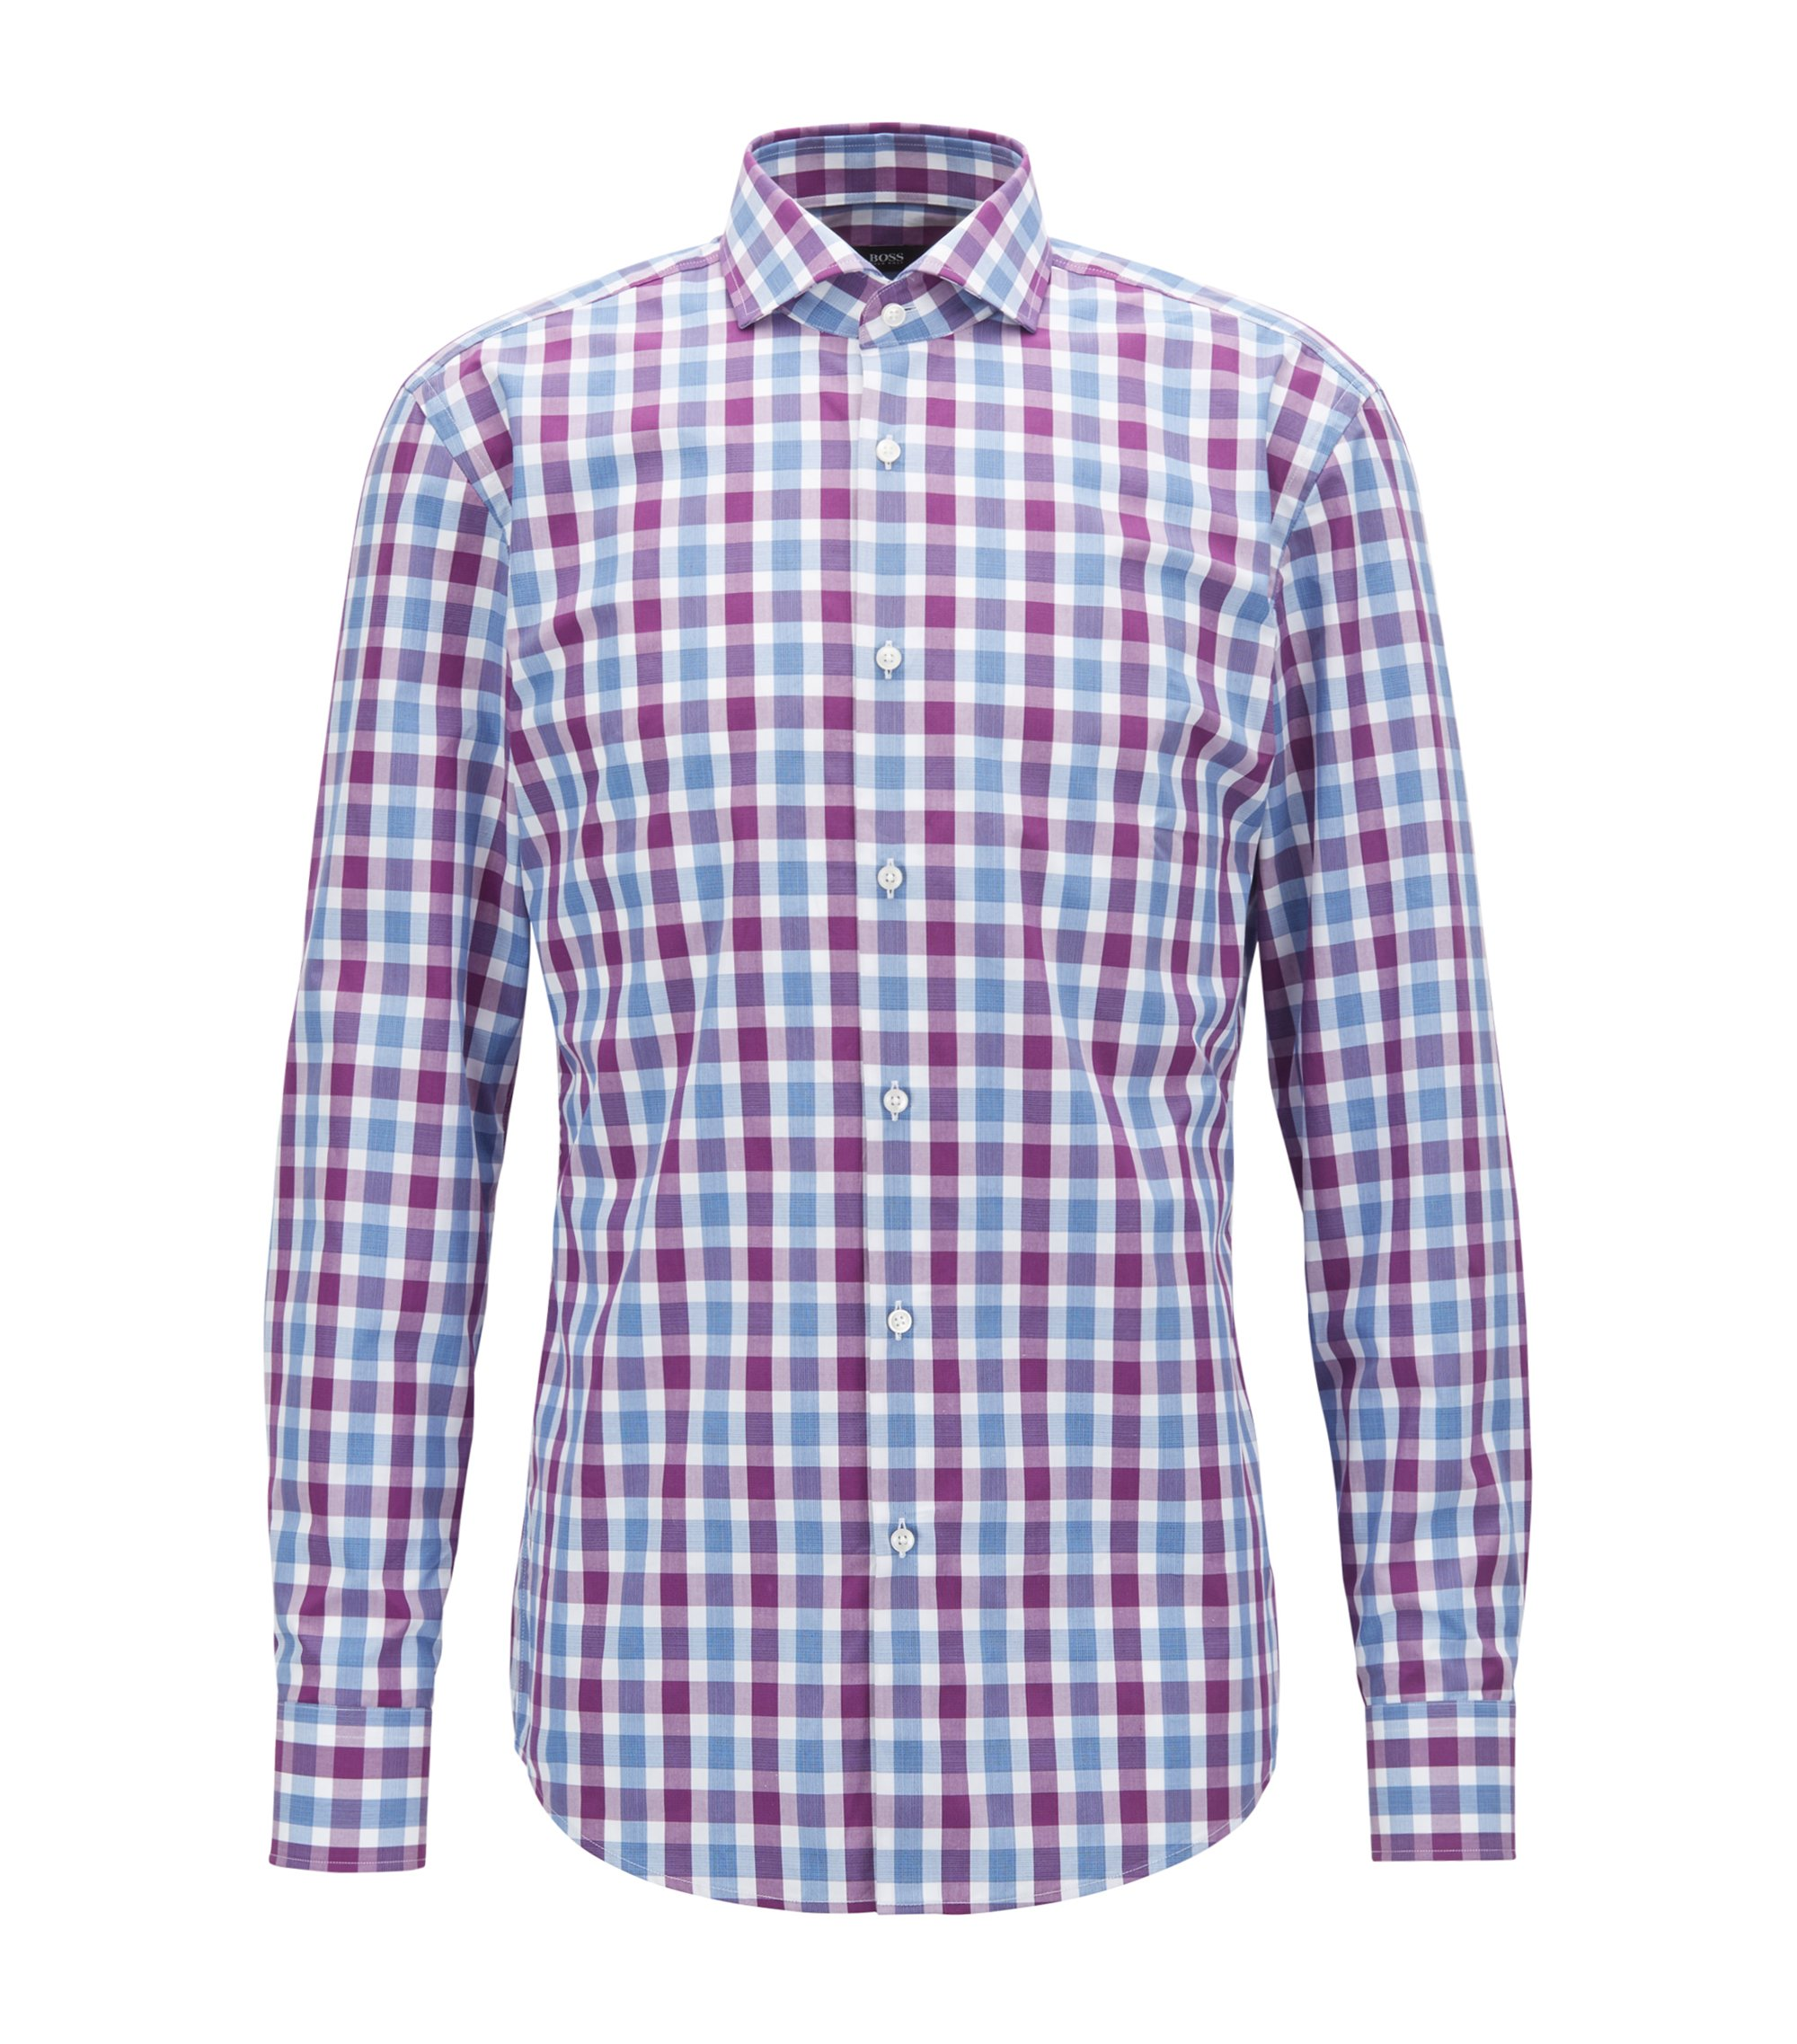 Slim-fit shirt in Vichy-check cotton poplin, Dark pink